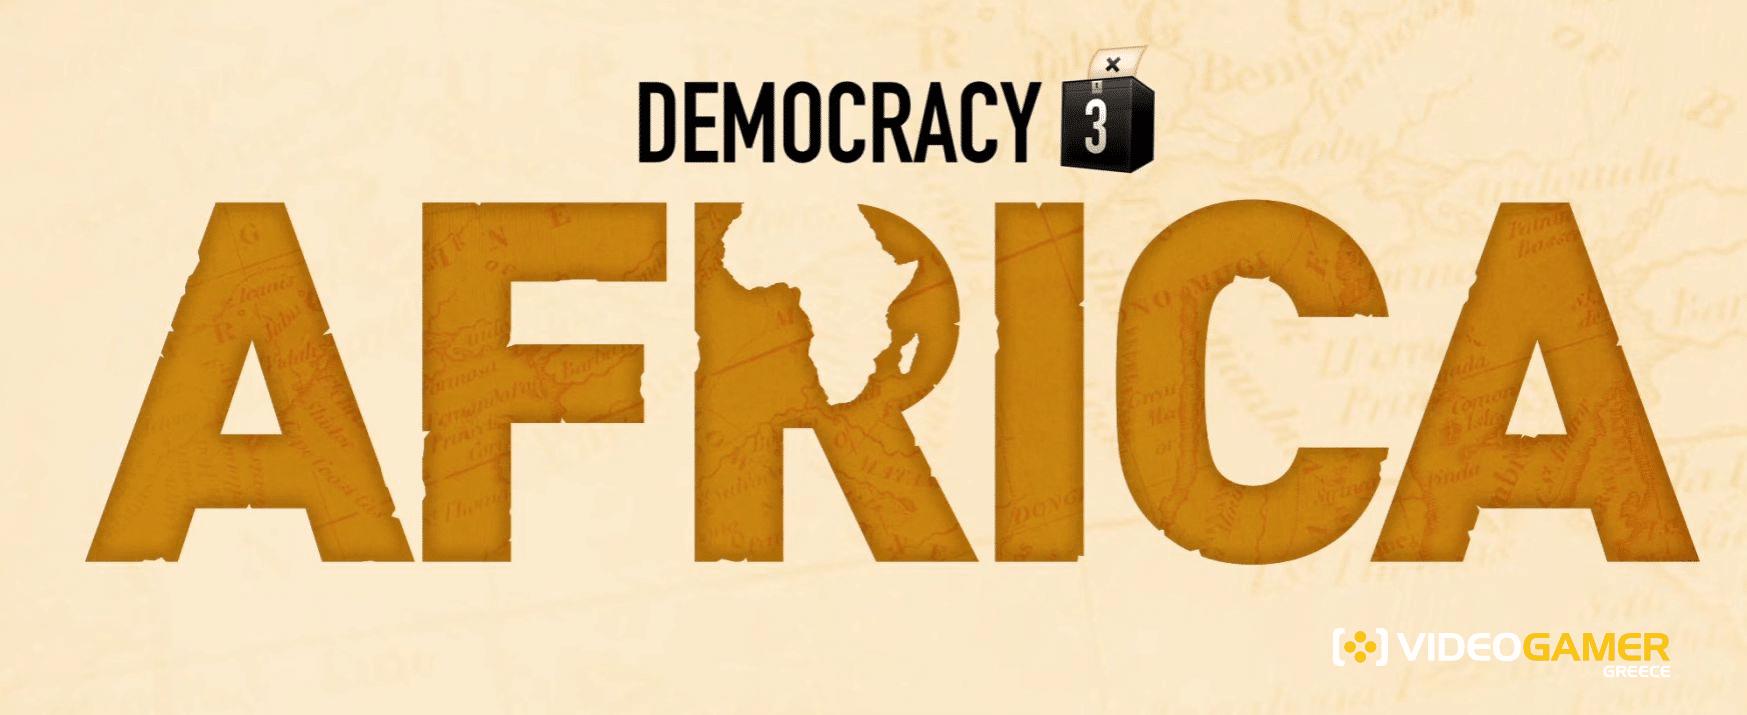 Democracy VideoGamer